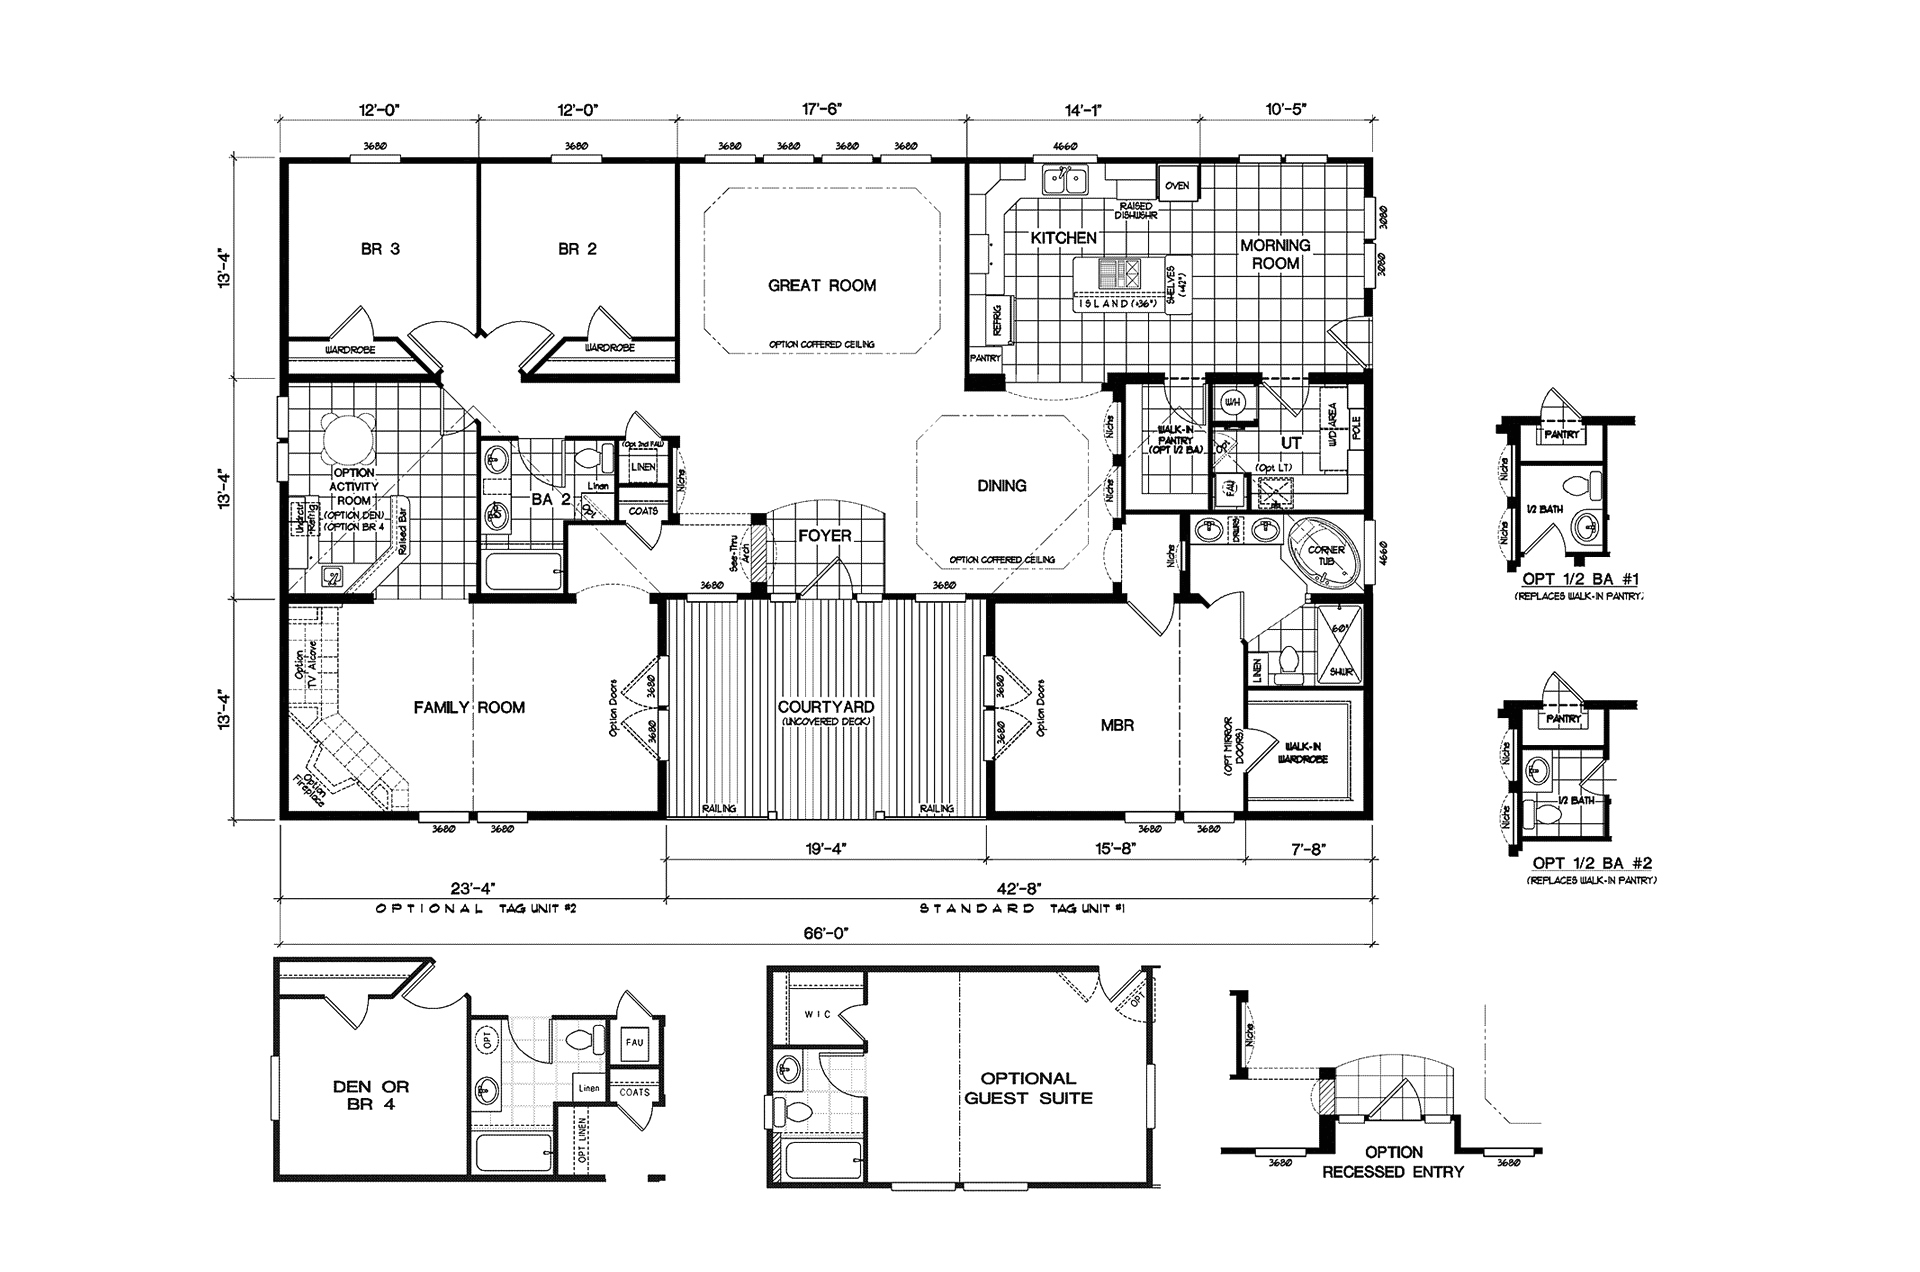 Homes Of Merit Floor Plans 1997 Homes Of Merit Floor Plans Homes Merit Floor Plans Lovely Floor